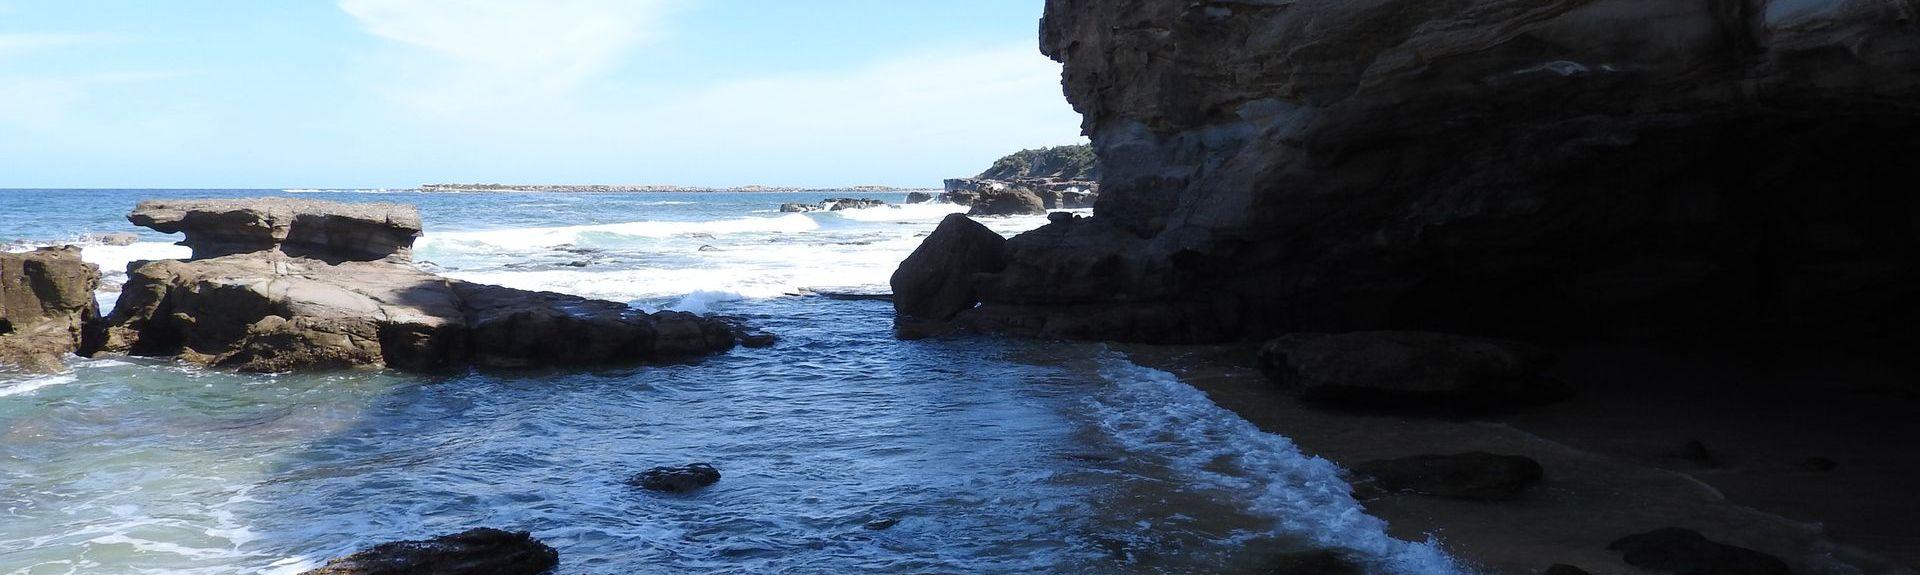 Caves Beach, Nieuw-Zuid-Wales, Australië